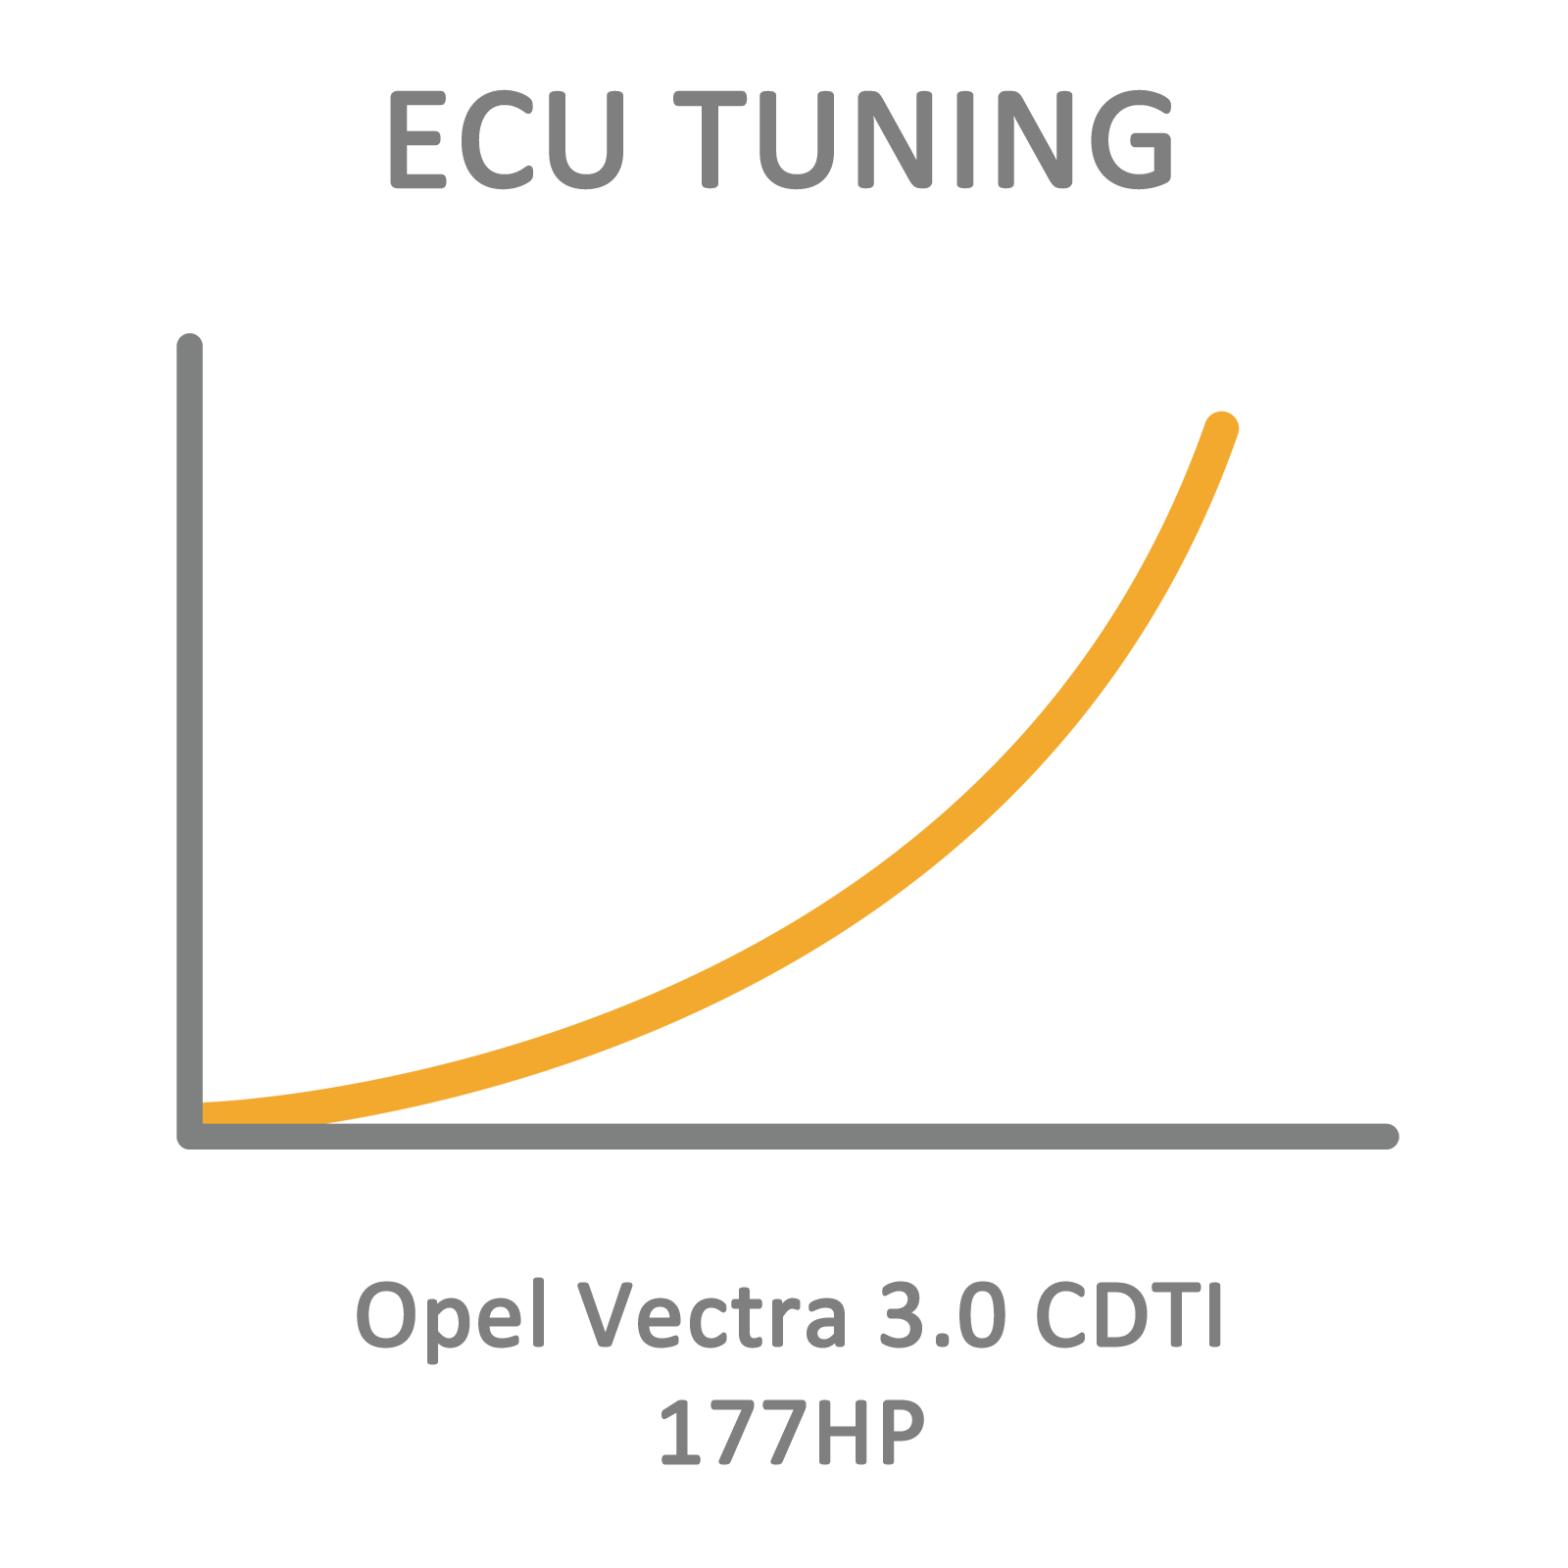 Opel Vectra 3.0 CDTI 177HP ECU Tuning Remapping Programming